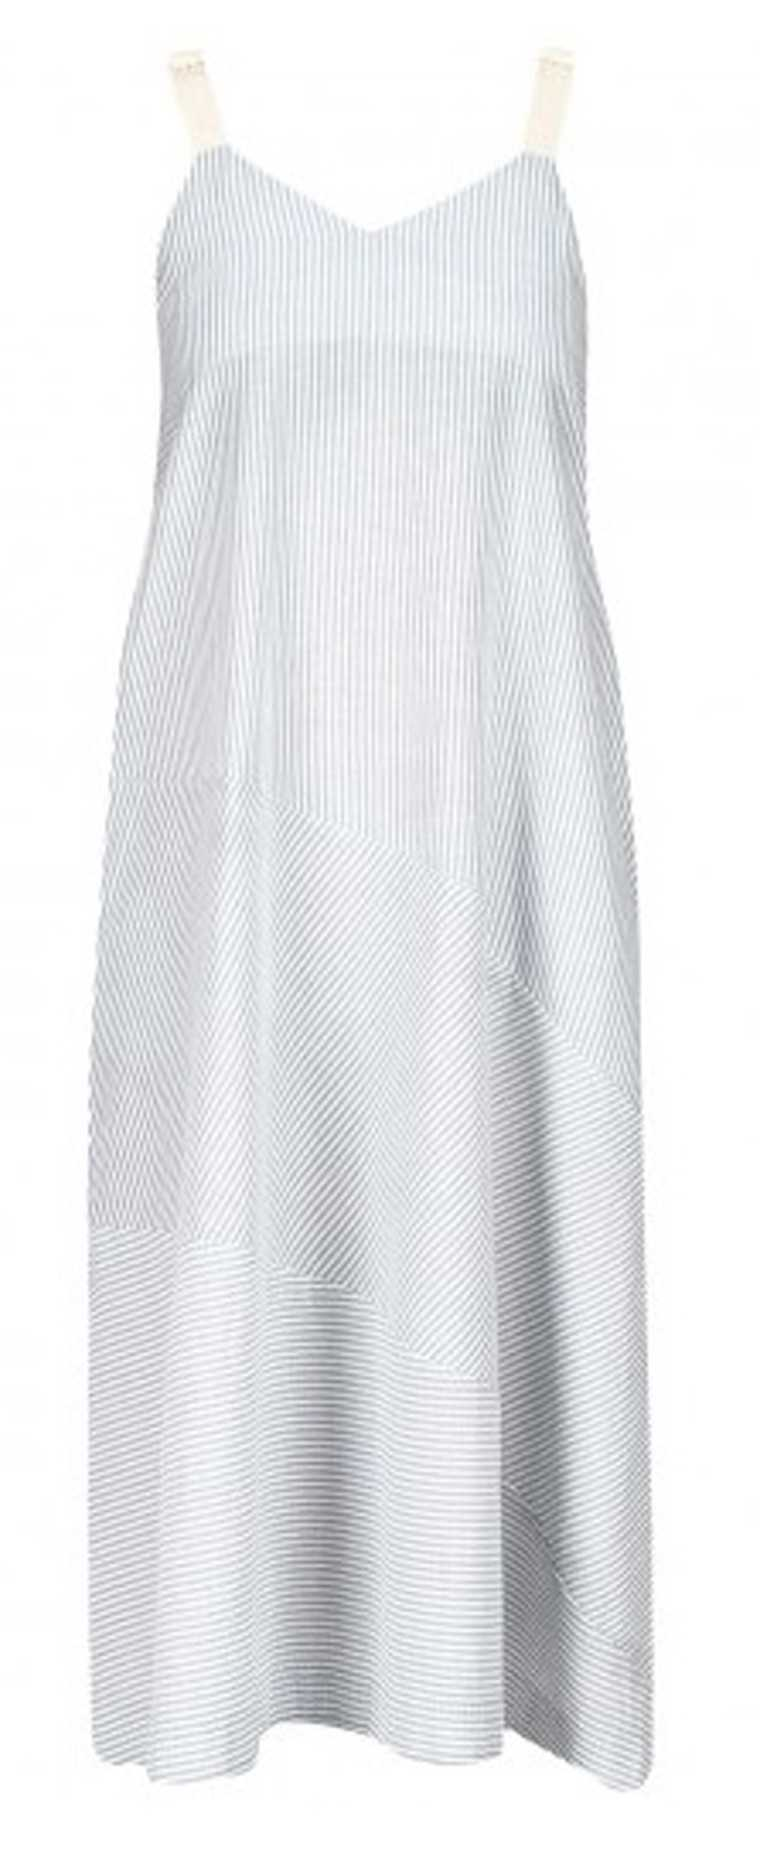 Cotton slip dress, Rs. 8,385, Dhurv Kapoor @ Perniaspopupshop.com